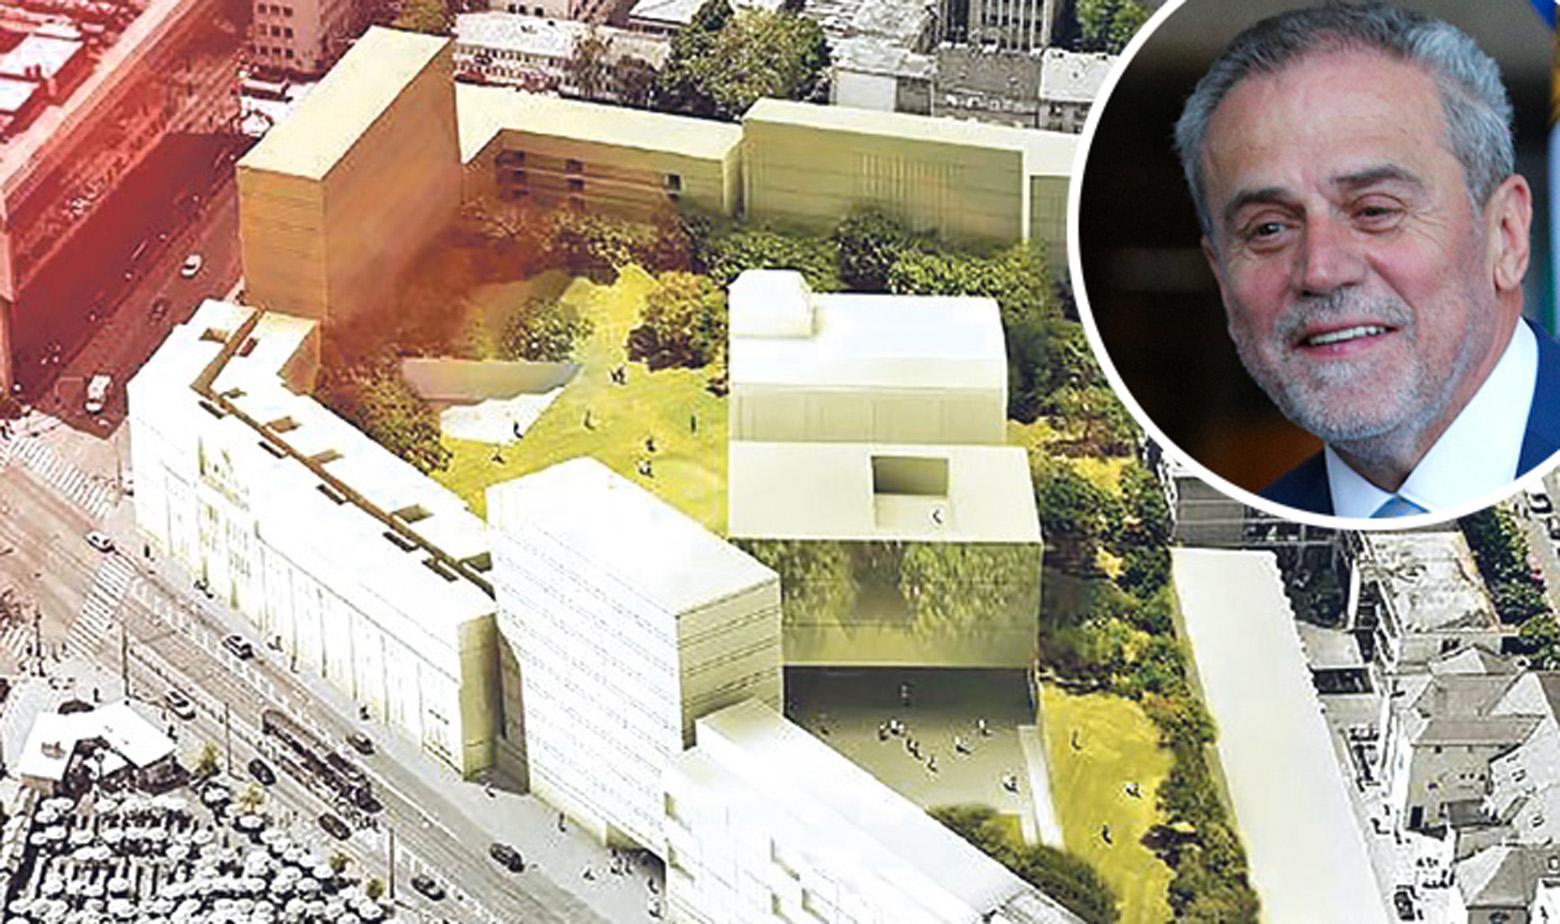 Izgled budućeg Bloka Badel prema radu arhitektonskog ureda Pablo Pita Architects